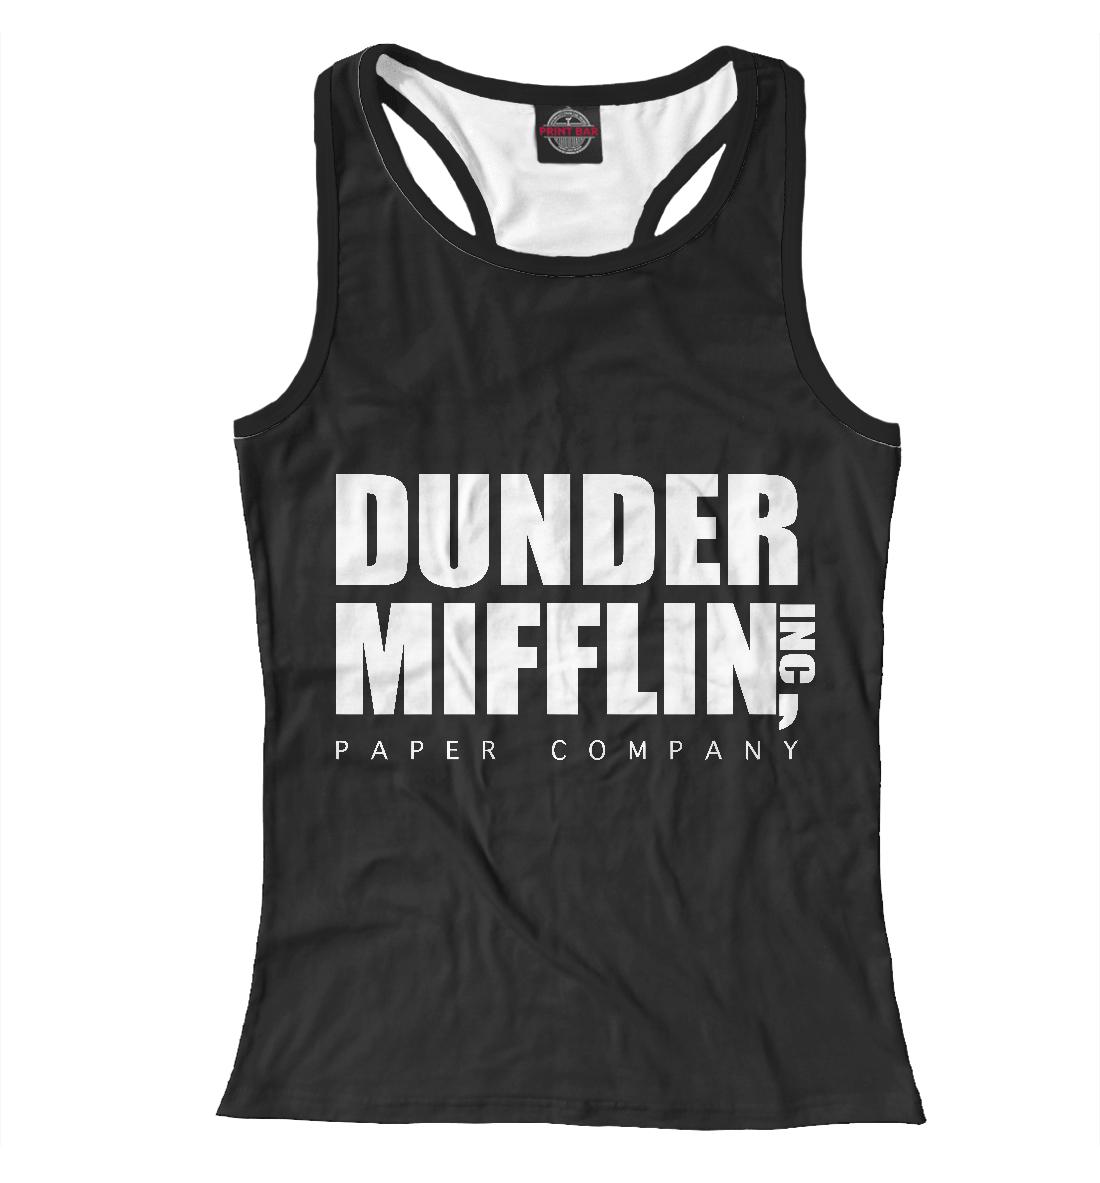 Купить Dunder Mifflin, Printbar, Майки борцовки, SOT-953379-mayb-1